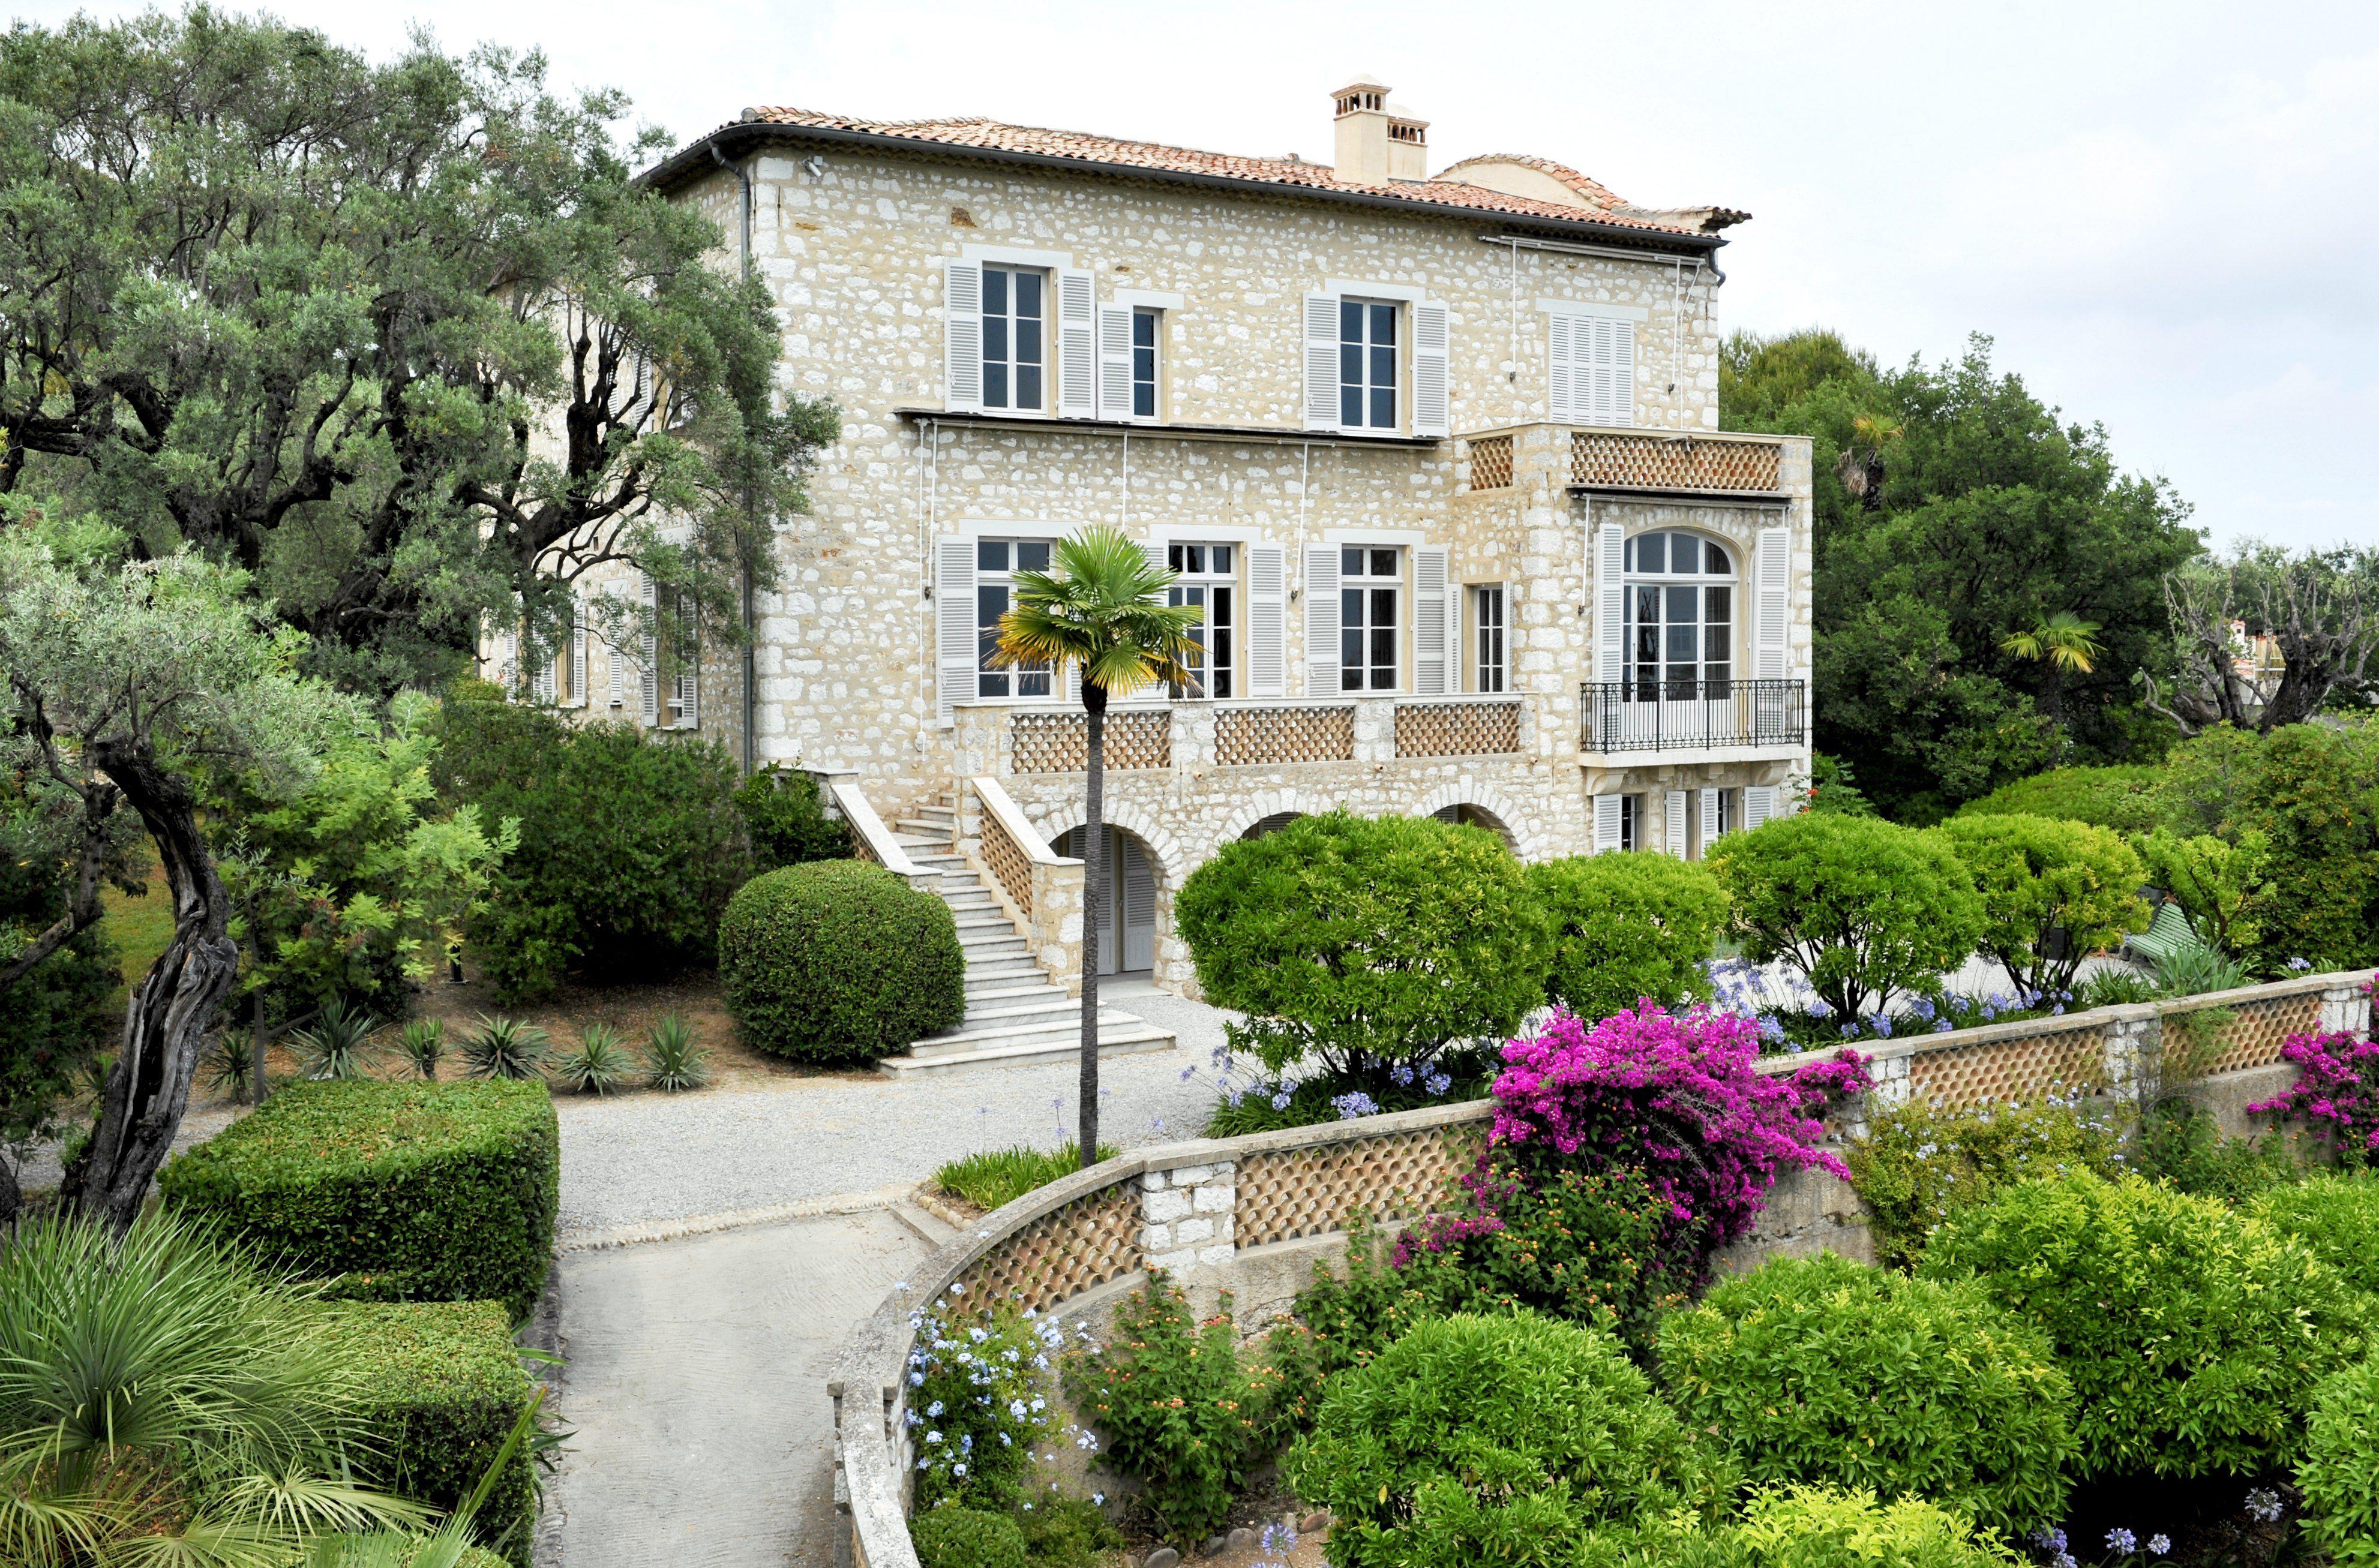 renoir 39 s house in cagnes sur mer on the cote d 39 azur. Black Bedroom Furniture Sets. Home Design Ideas